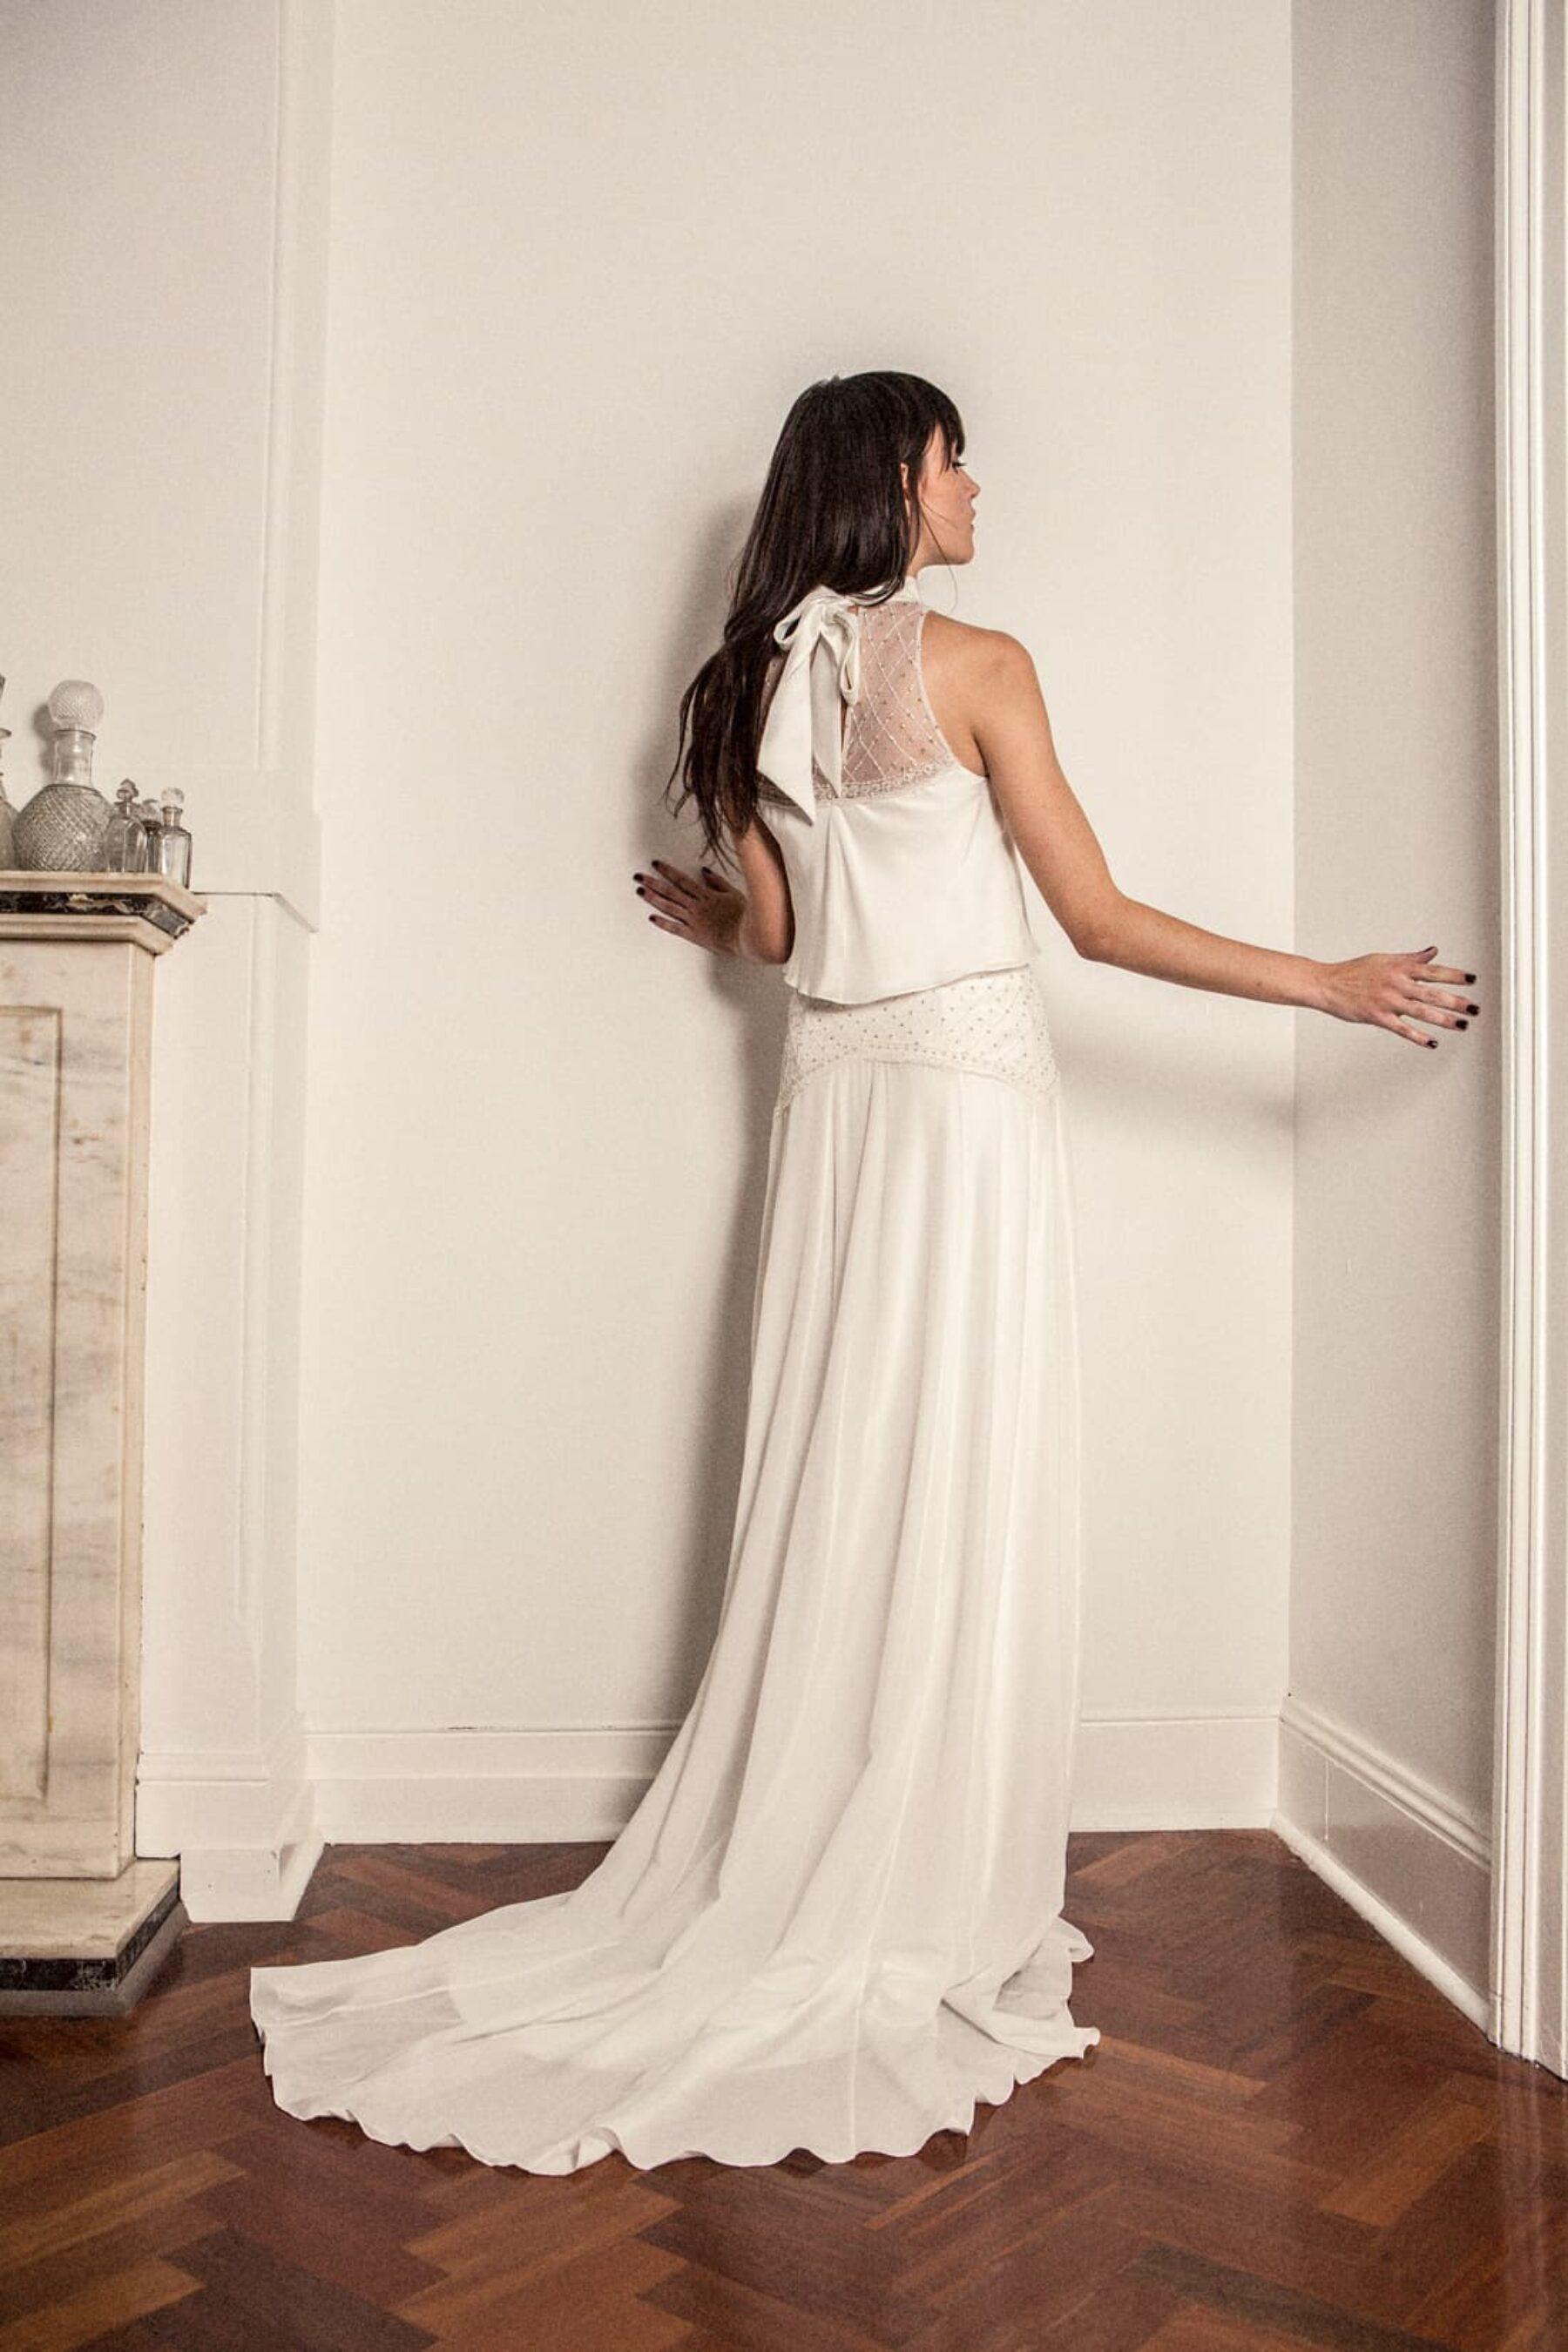 halterneck wedding dress by Bo & Luca